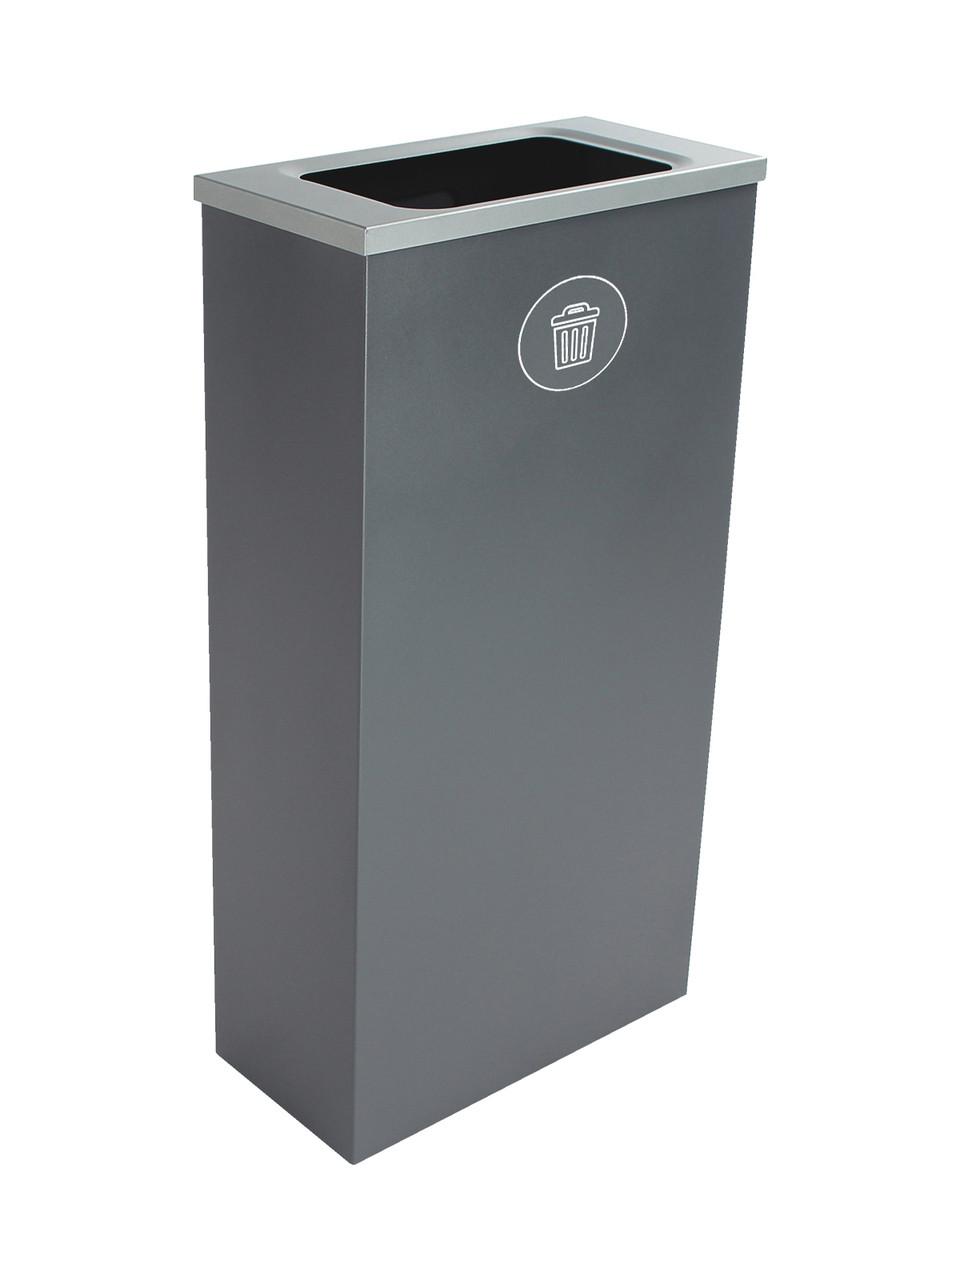 10 Gallon Steel Spectrum Slim Trash Can Gray 8107068-4